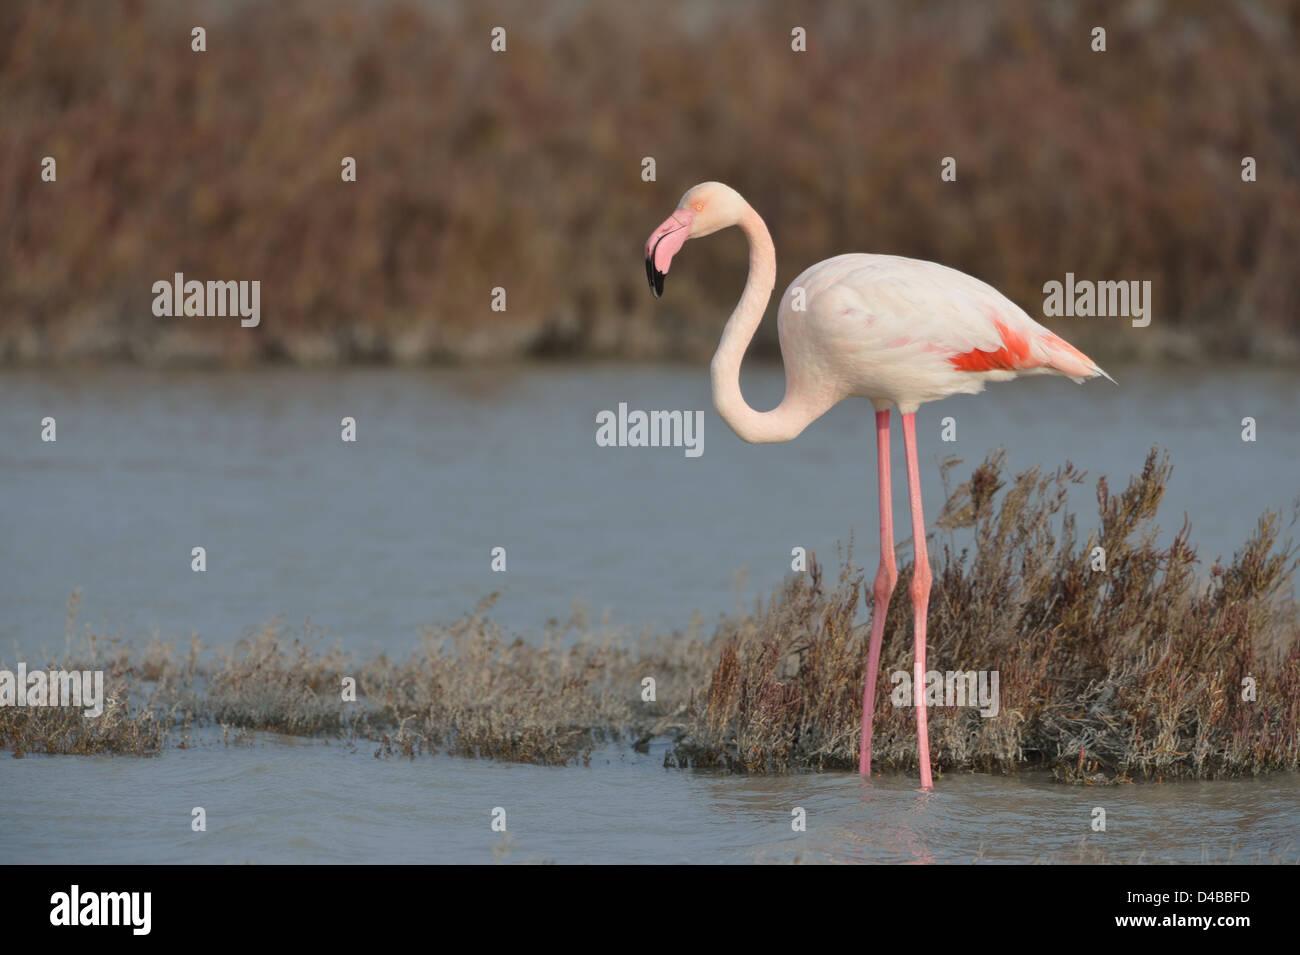 Greater Flamingo (Phoenicopterus roseus - Phoenicopterus ruber roseus) standing in shallow water in winter - Stock Image